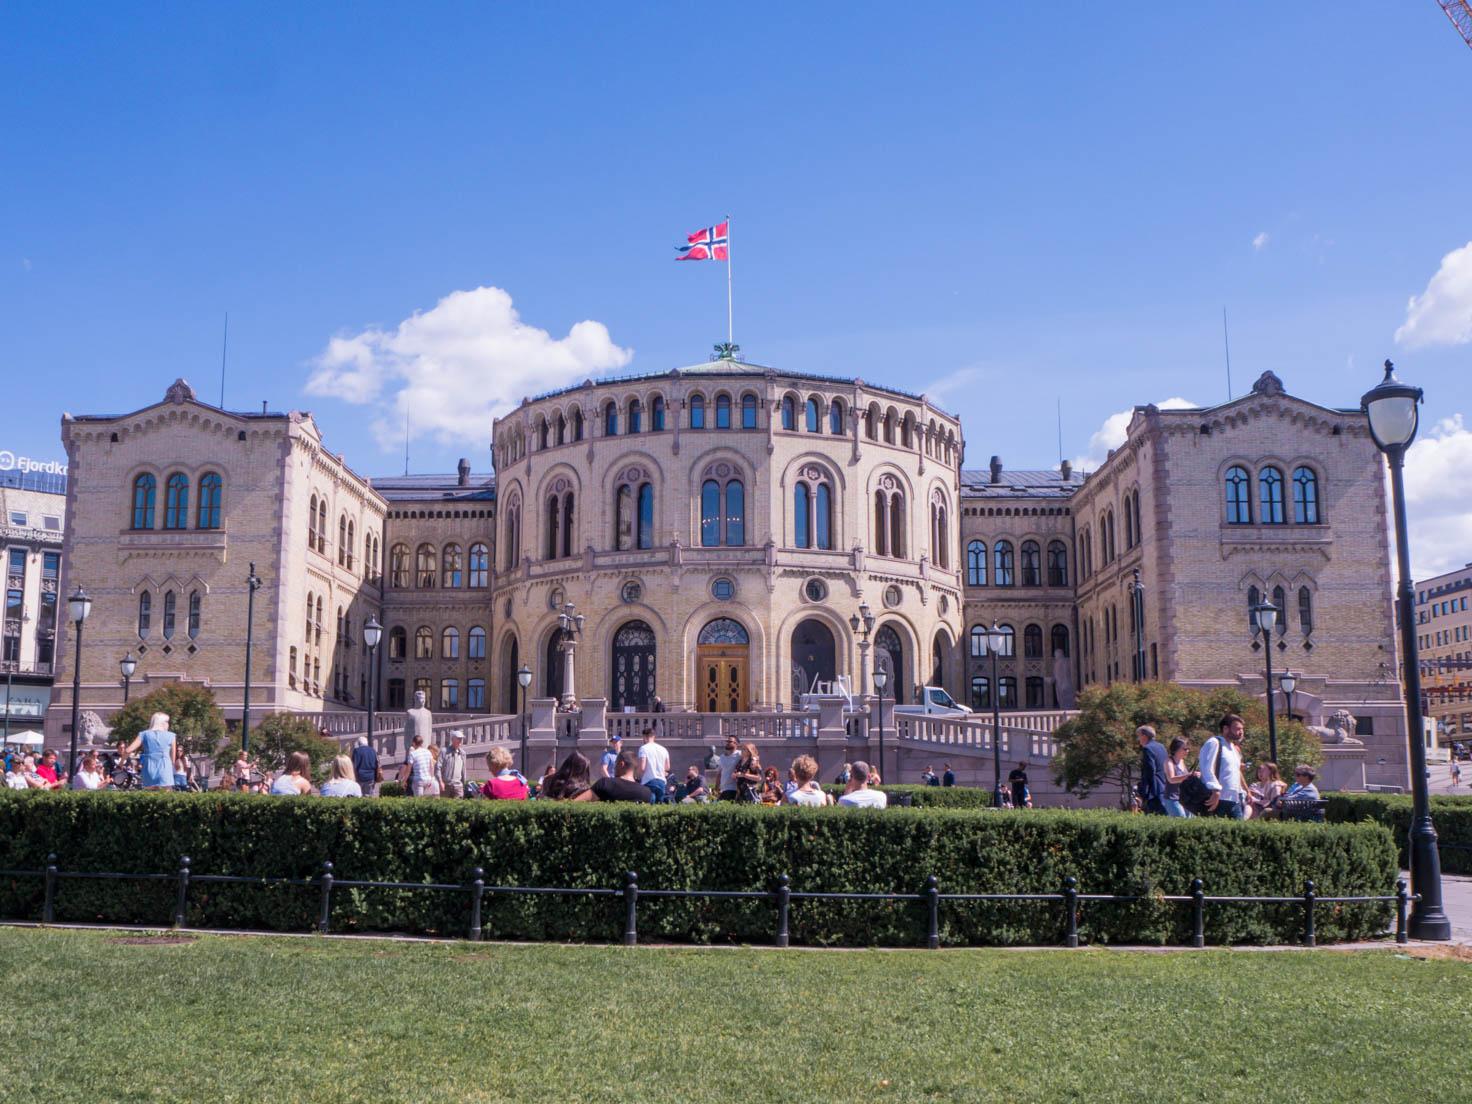 Parliament building in Oslo, Norway